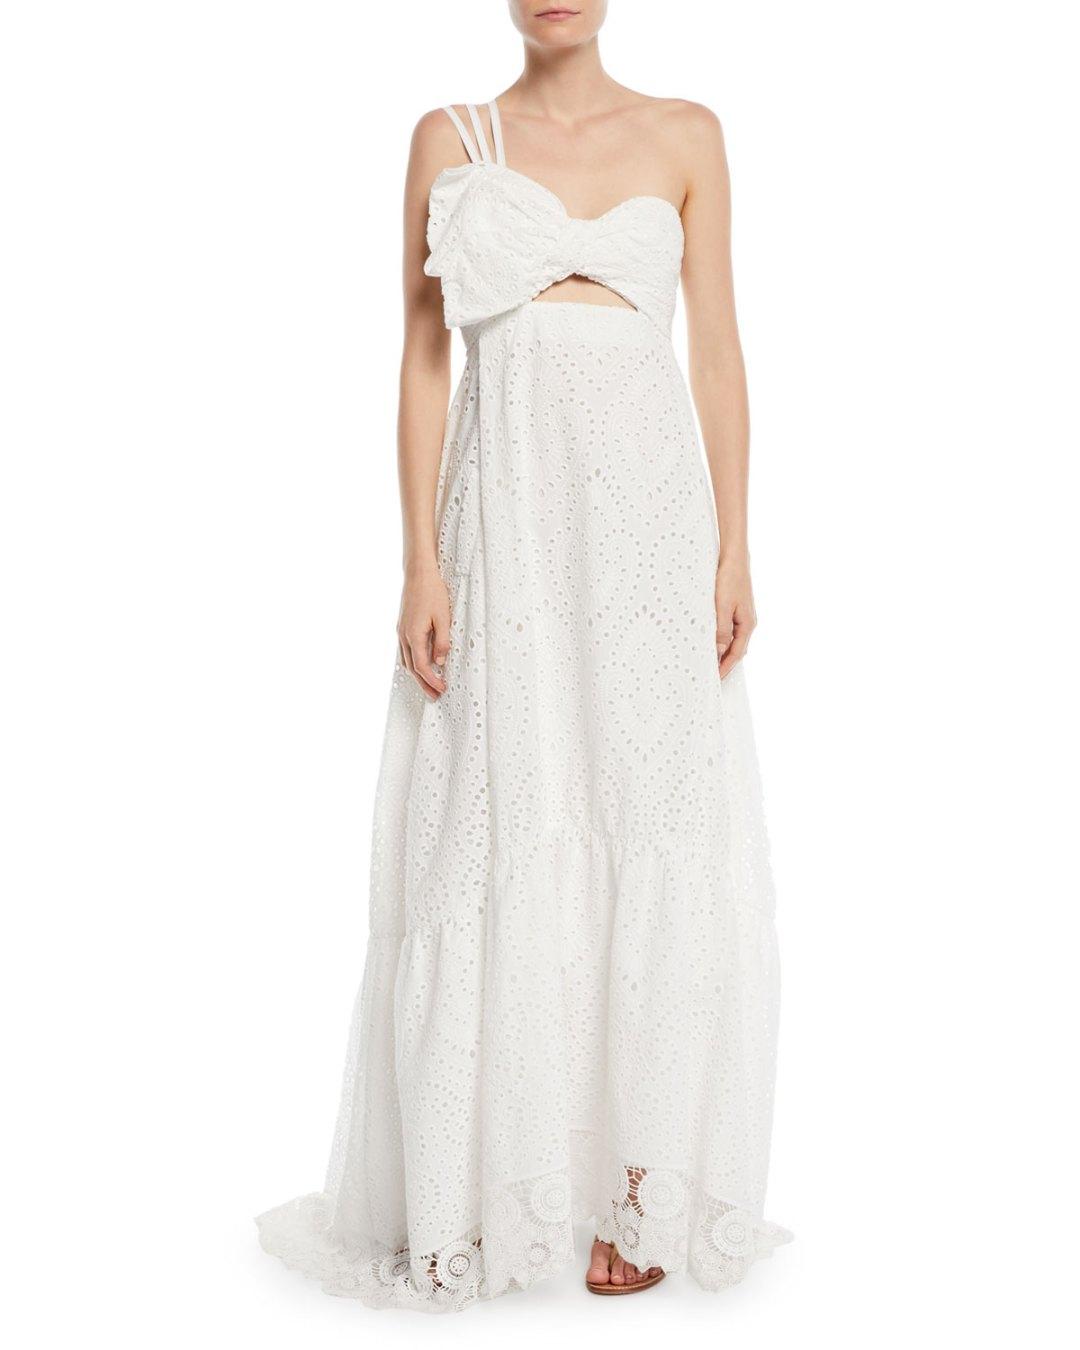 JOHANNA ORTIZ – Mary Queen of Scots Faille Midi Skirt – Bergdorf Goodman  (Neiman Marcus) –  2 a10a05b0eb8f